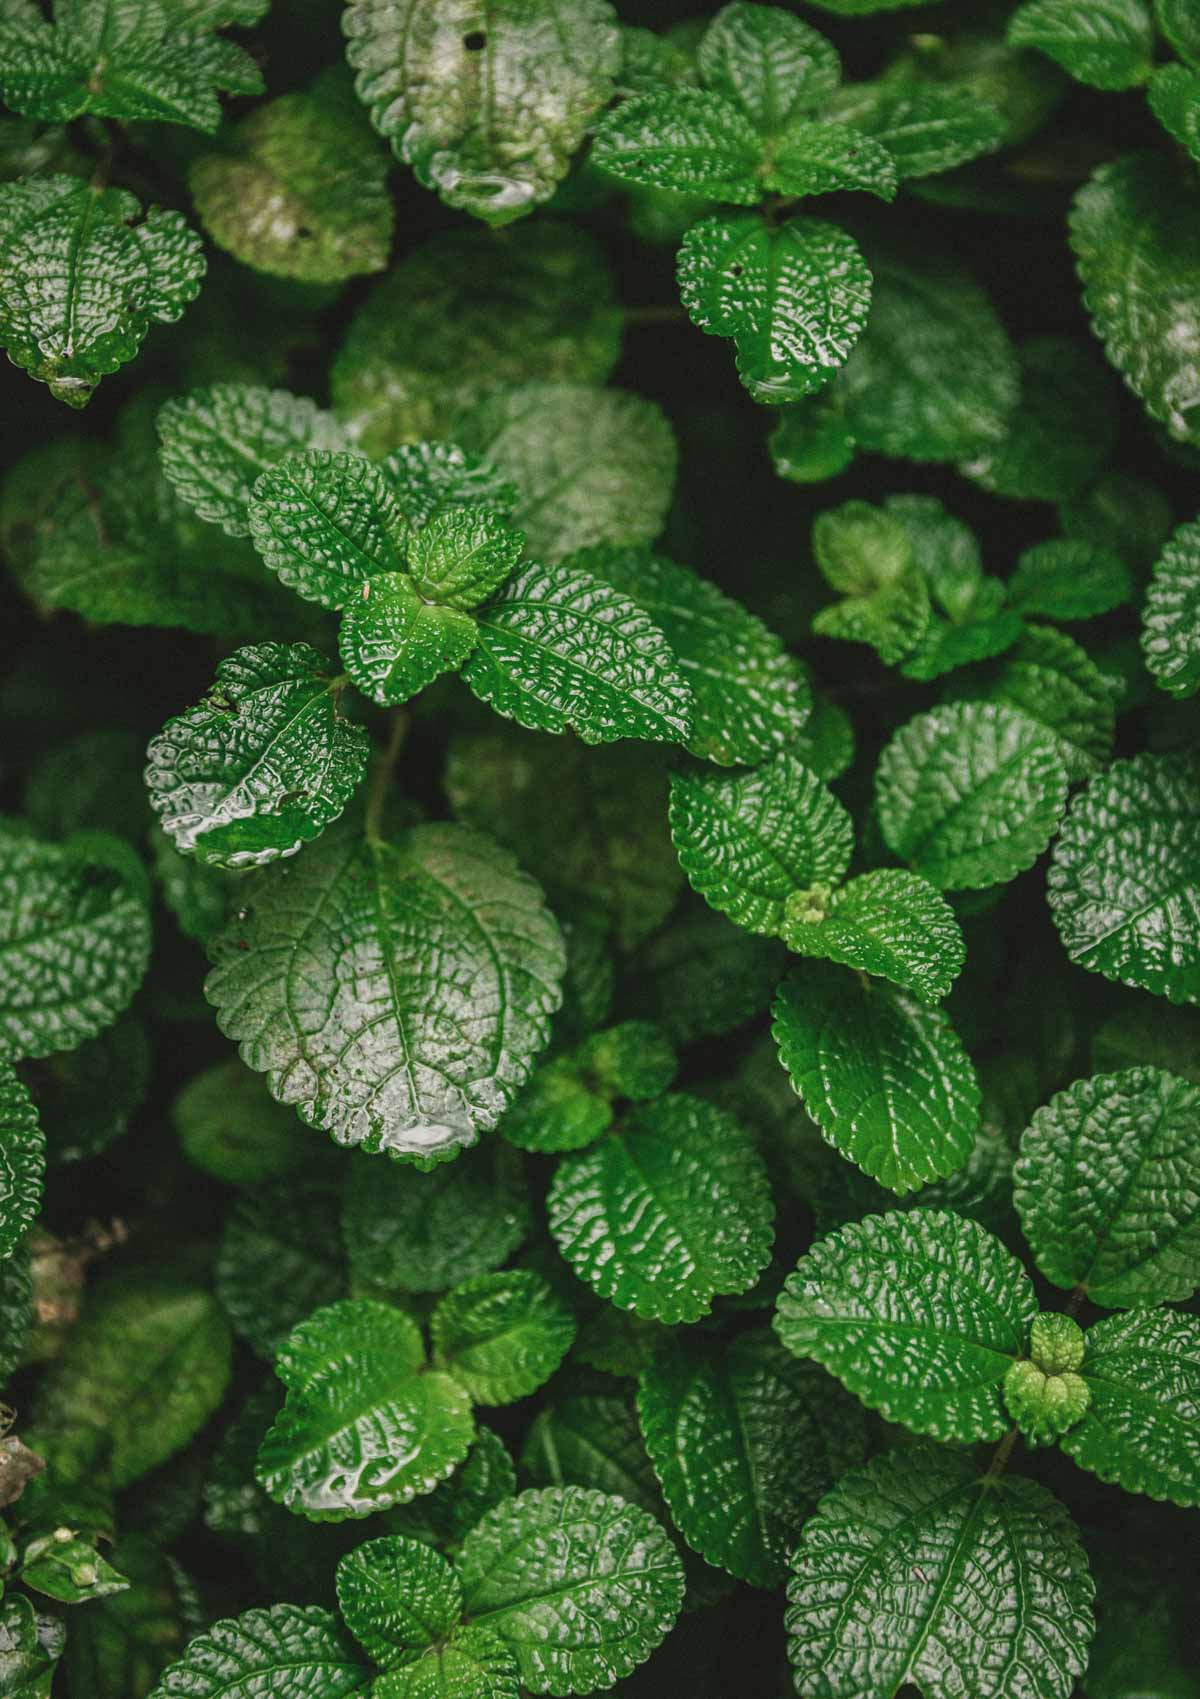 Mint leaves up close.